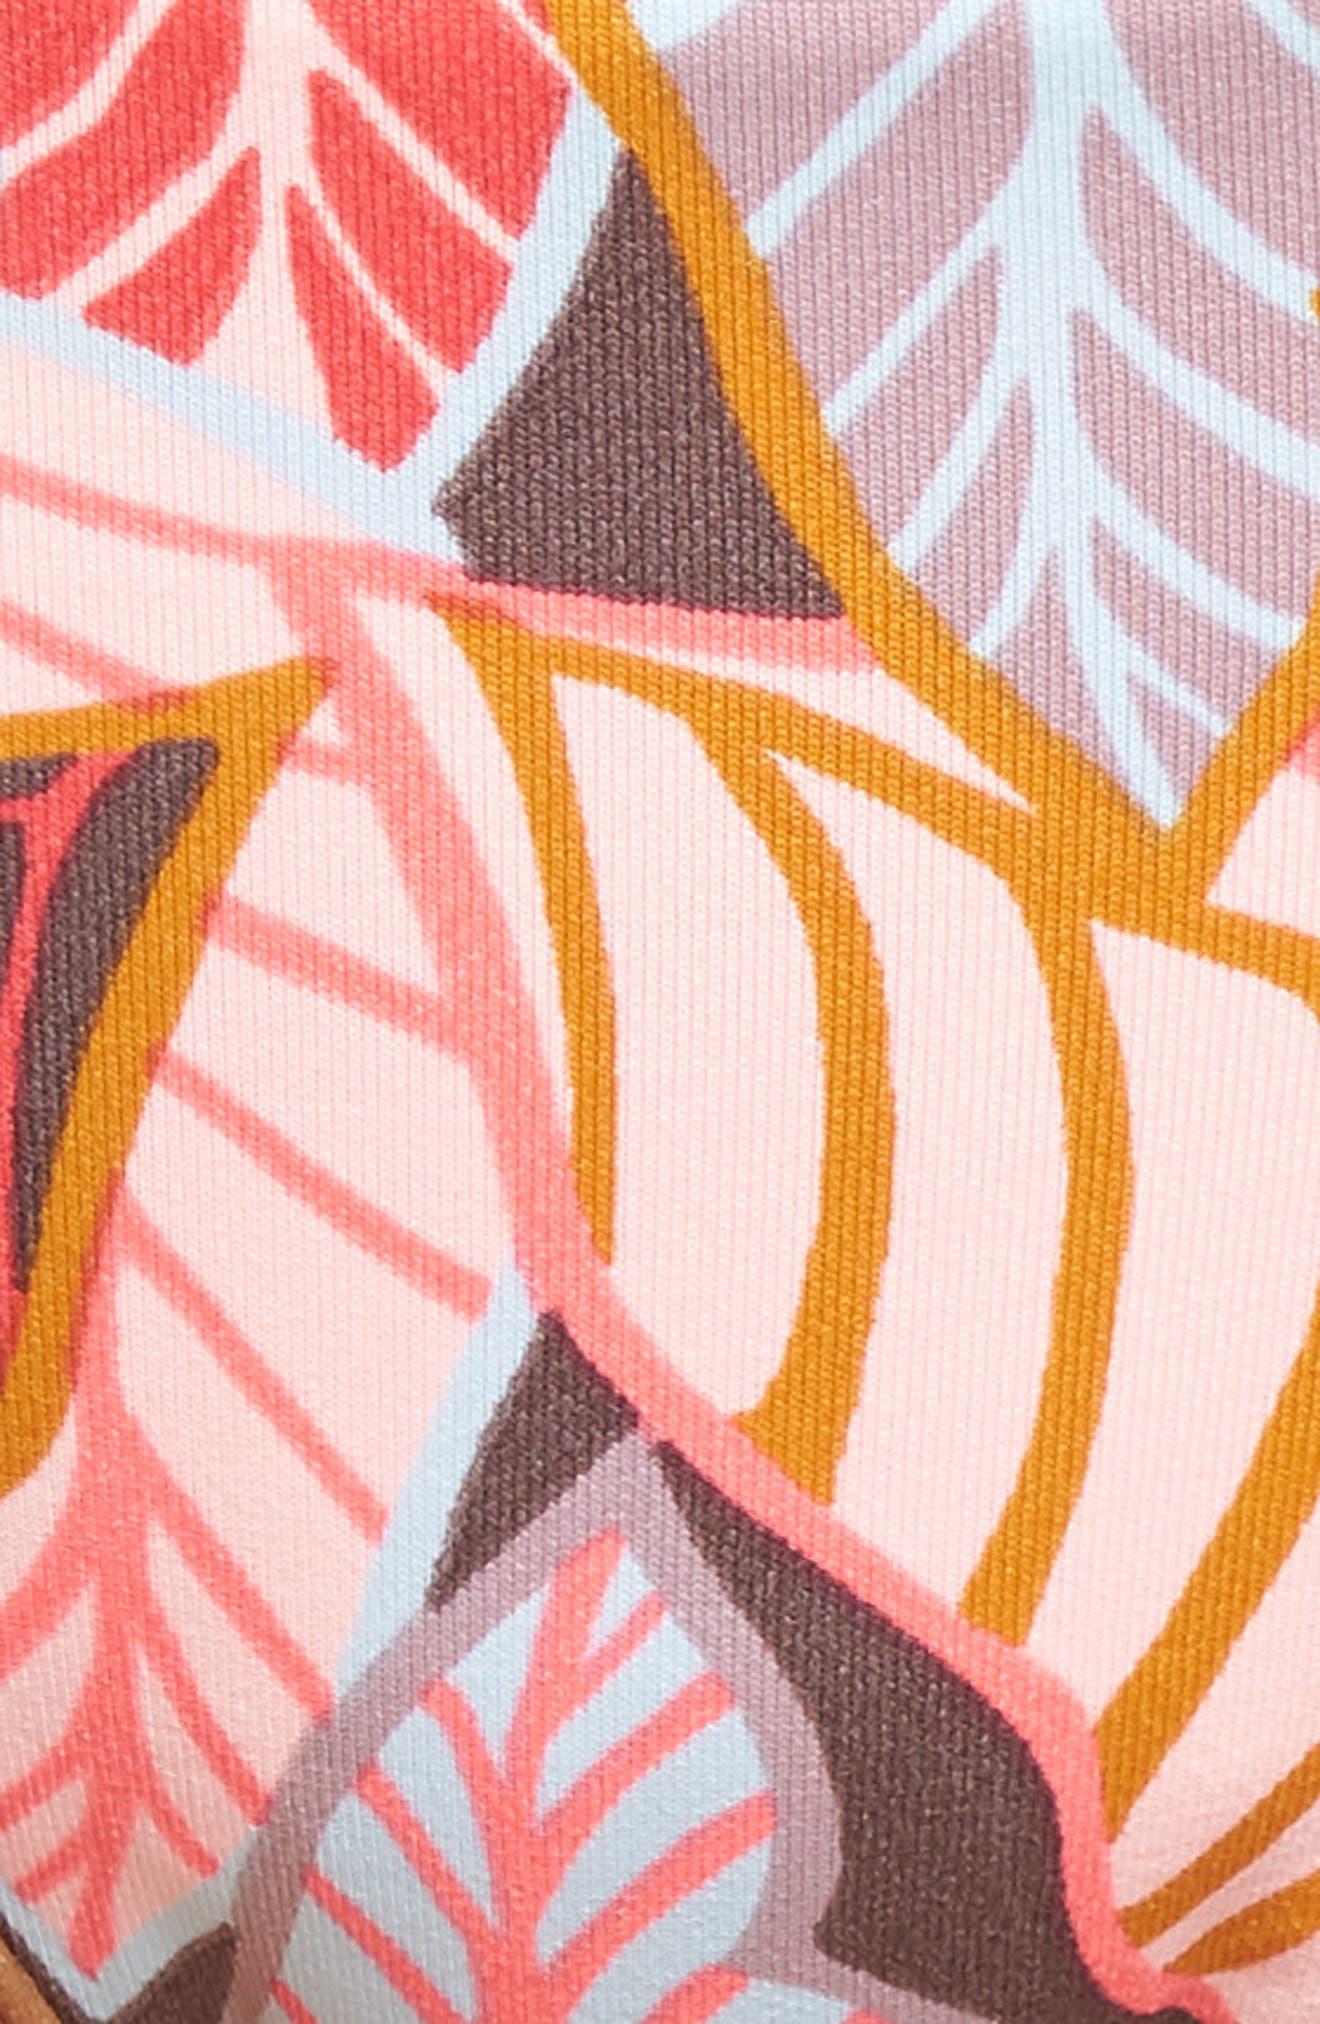 Andalusia Frills Bikini Bottoms,                             Alternate thumbnail 6, color,                             Red Multi